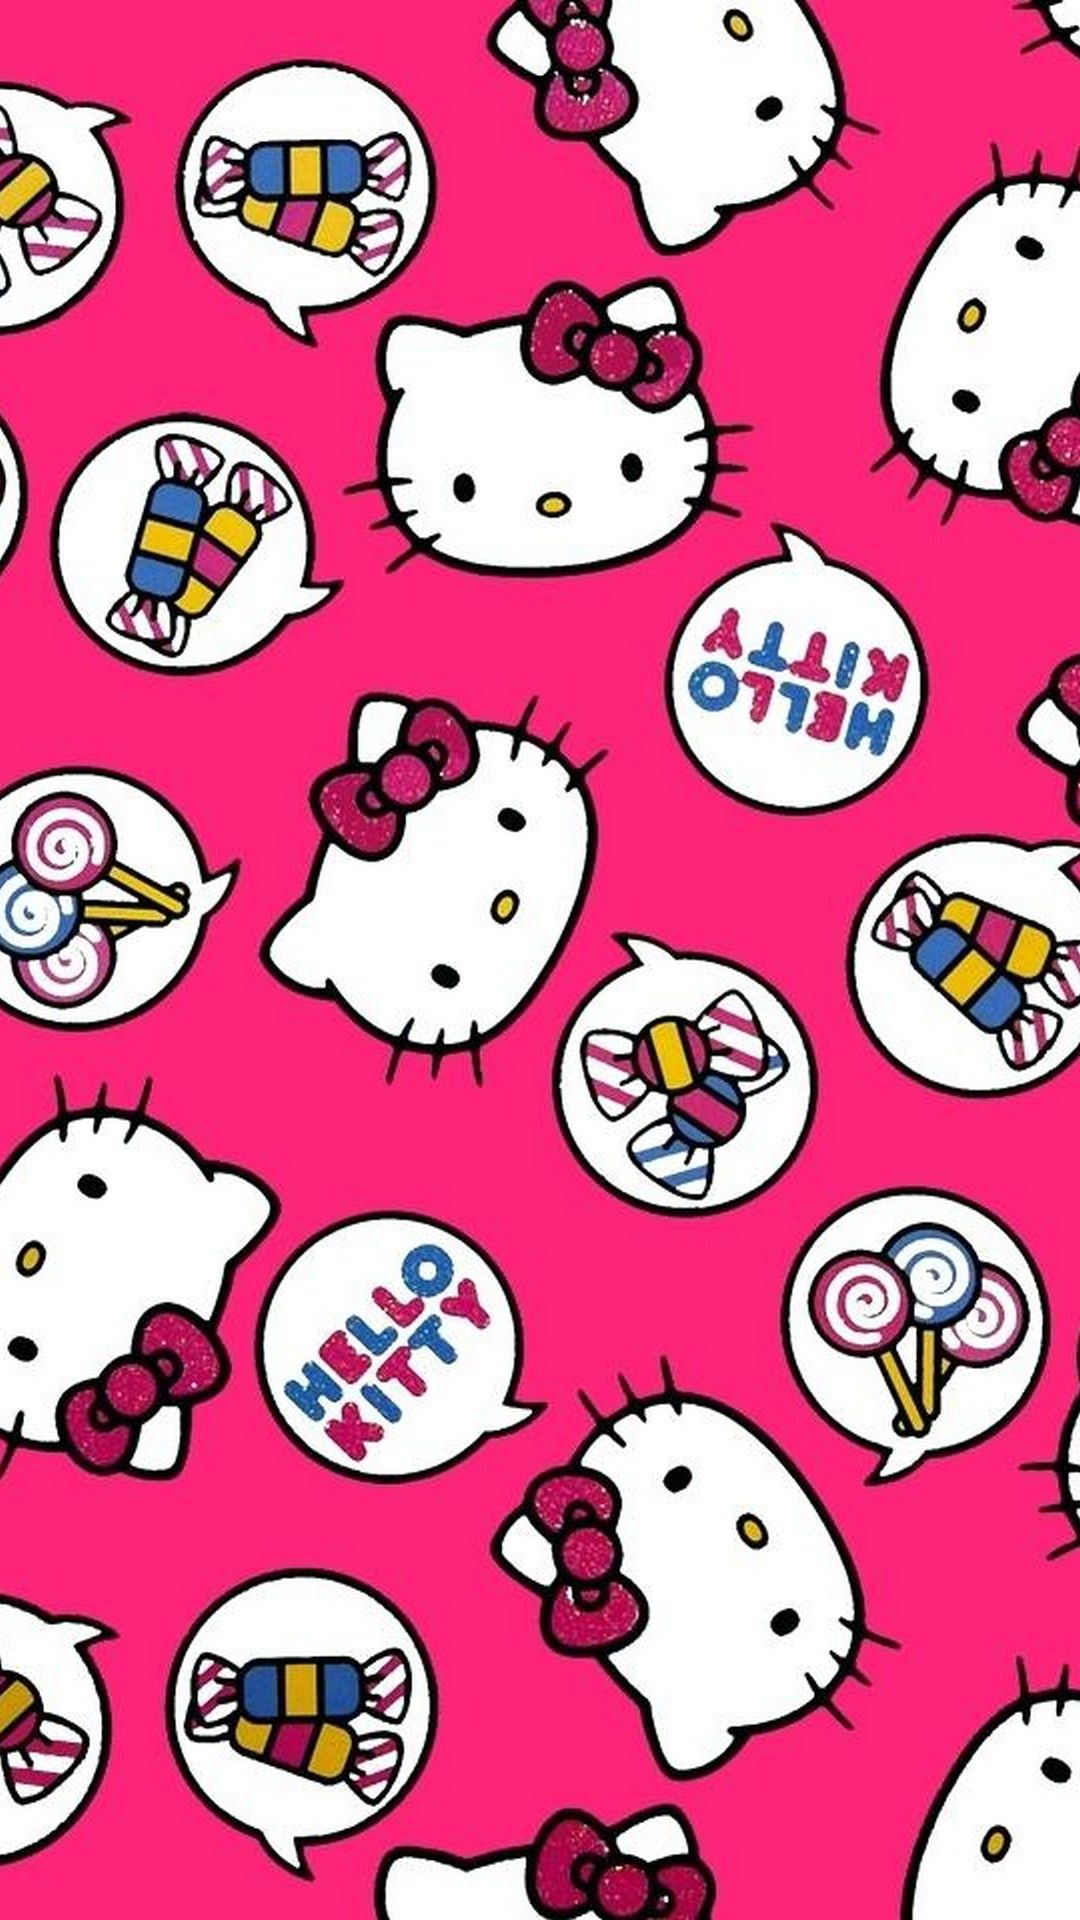 Sanrio Hello Kitty Iphone 6 Wallpaper Hello Kitty Backgrounds